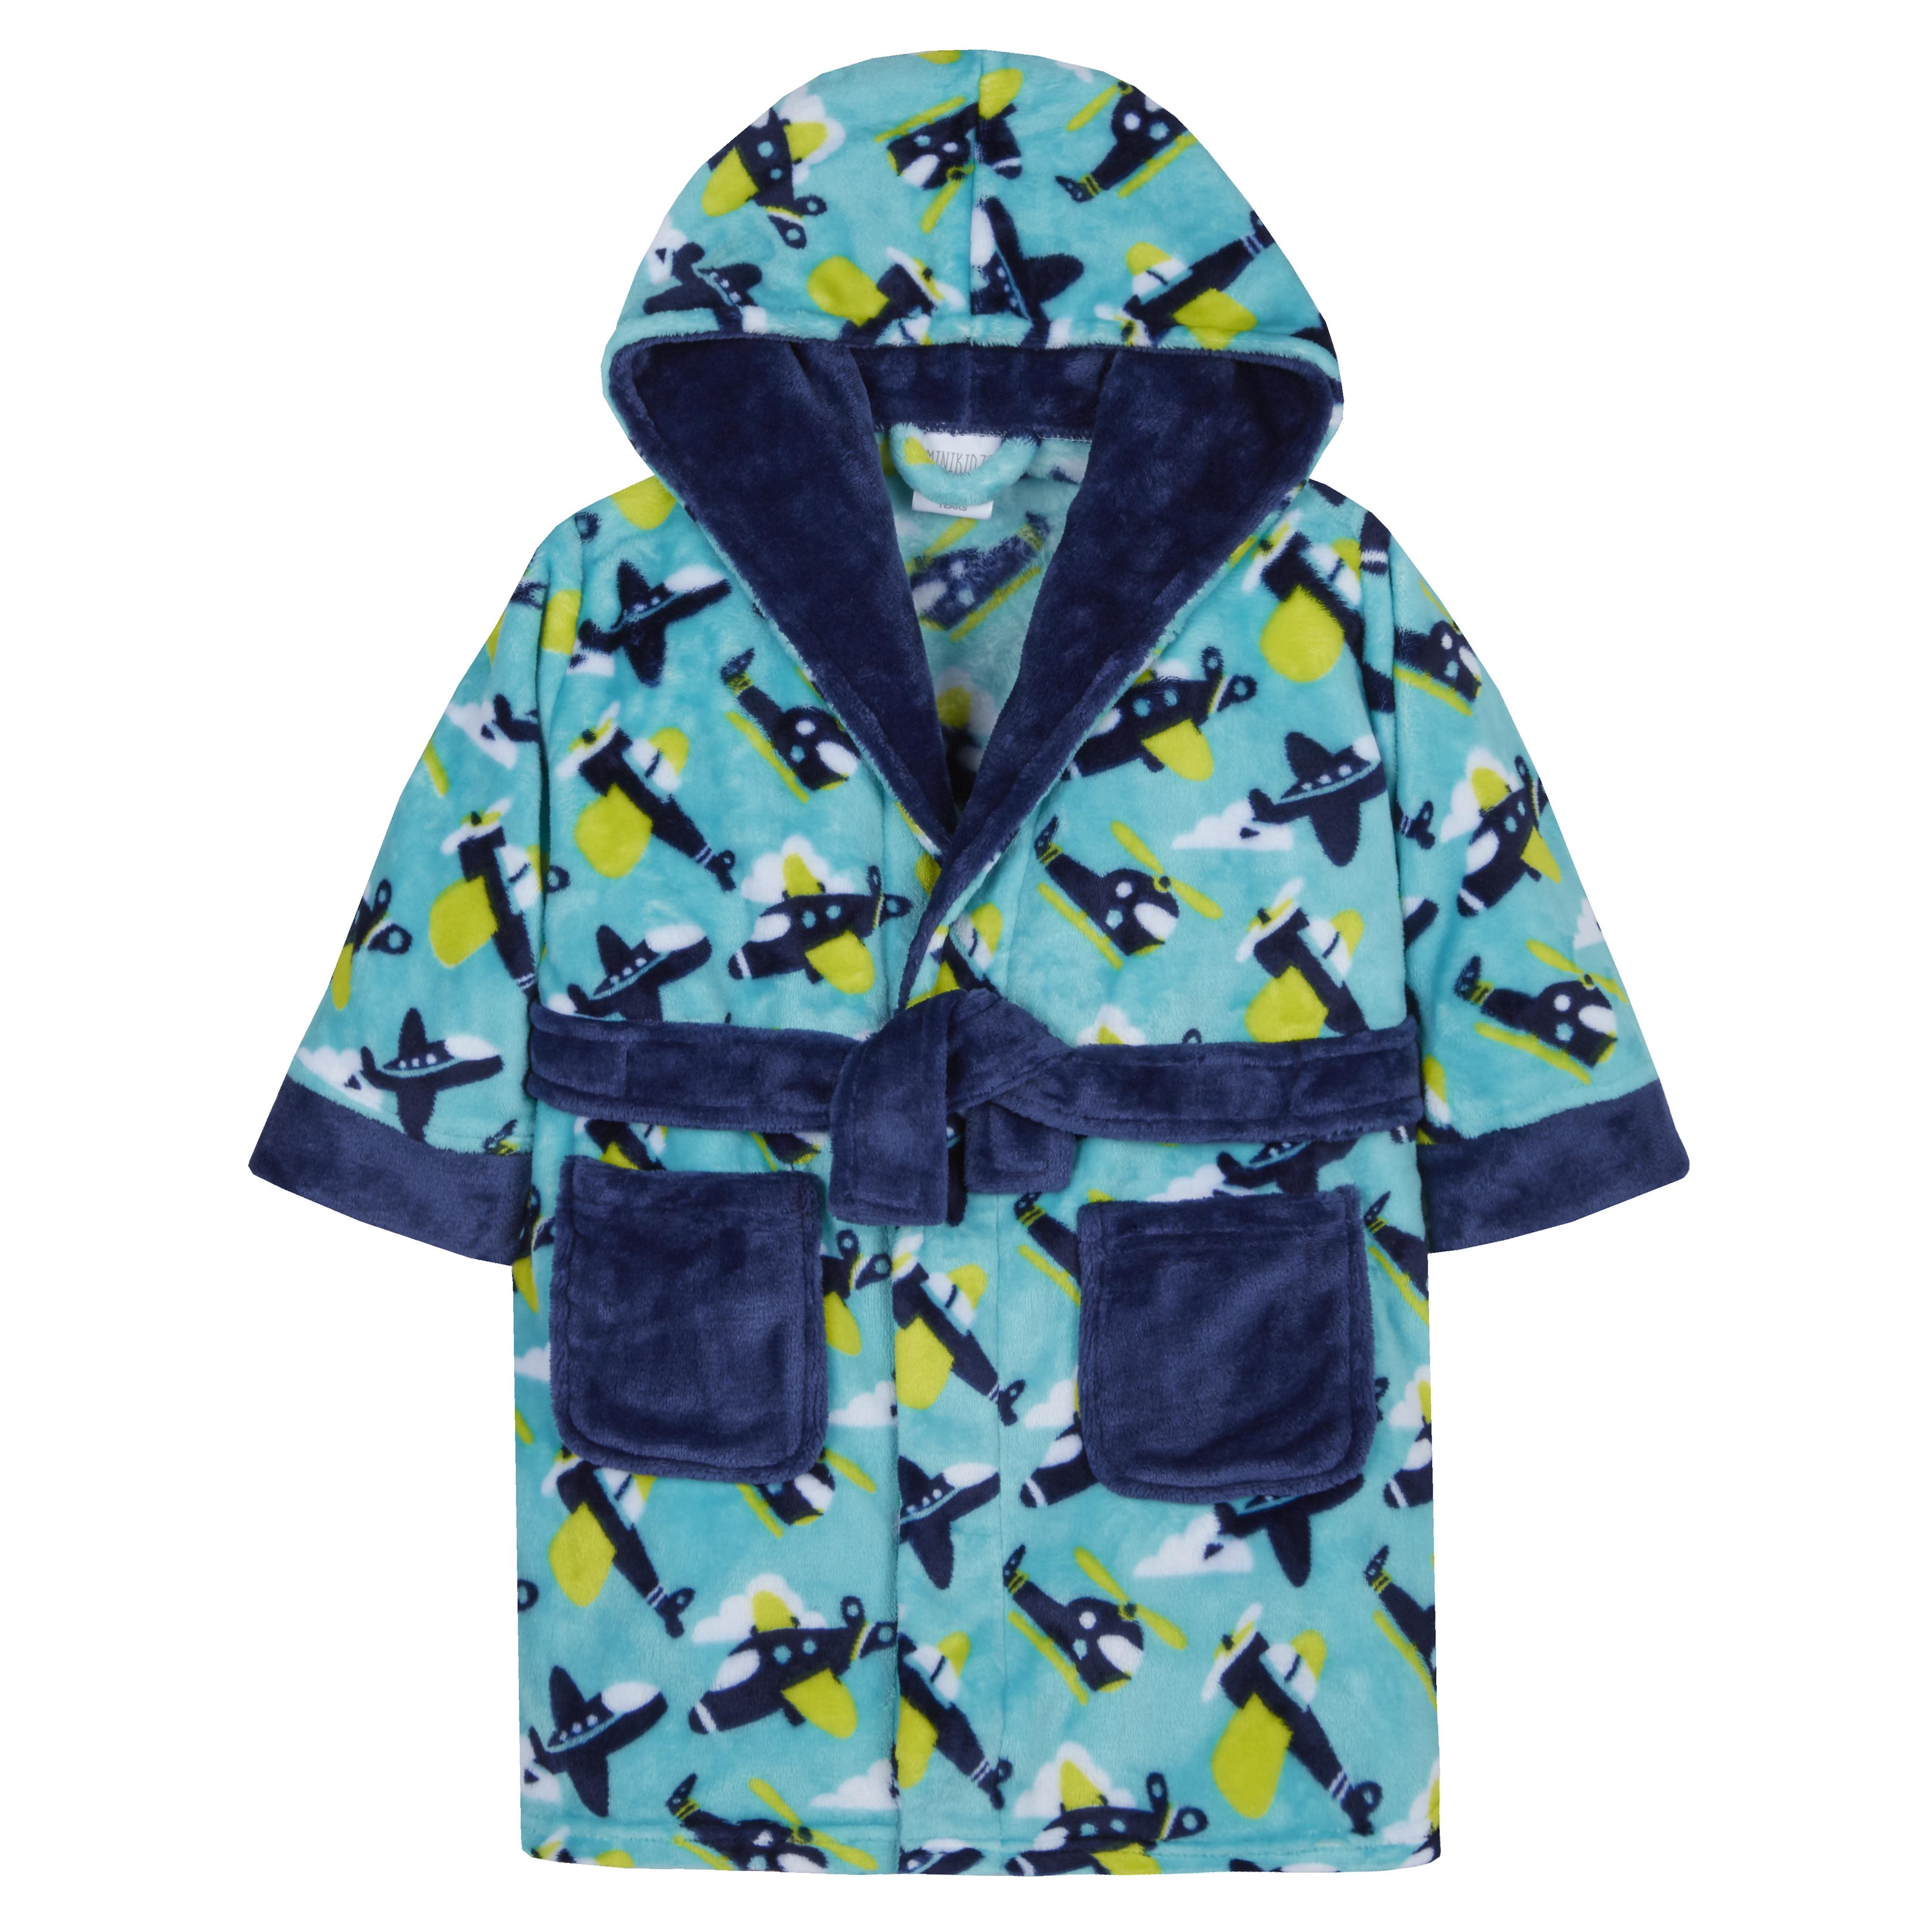 Minikidz Infant Boys Football Novelty Hooded Dressing Gown Bath Robe Nightwear Ages 2-13